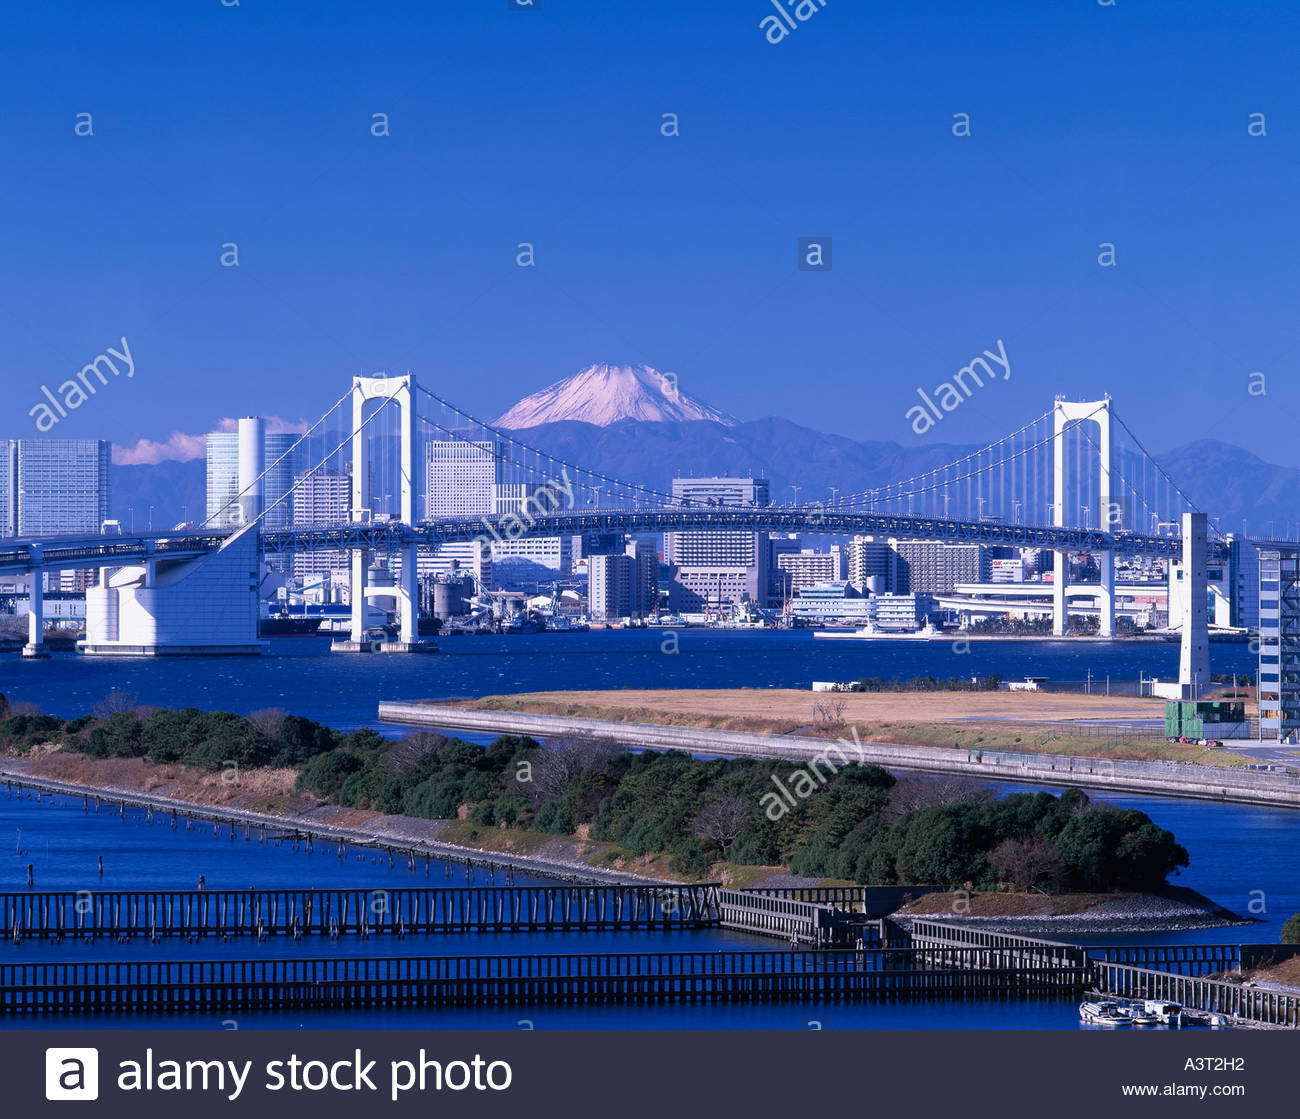 japan tokyo skyscrapers bridge - photo #12